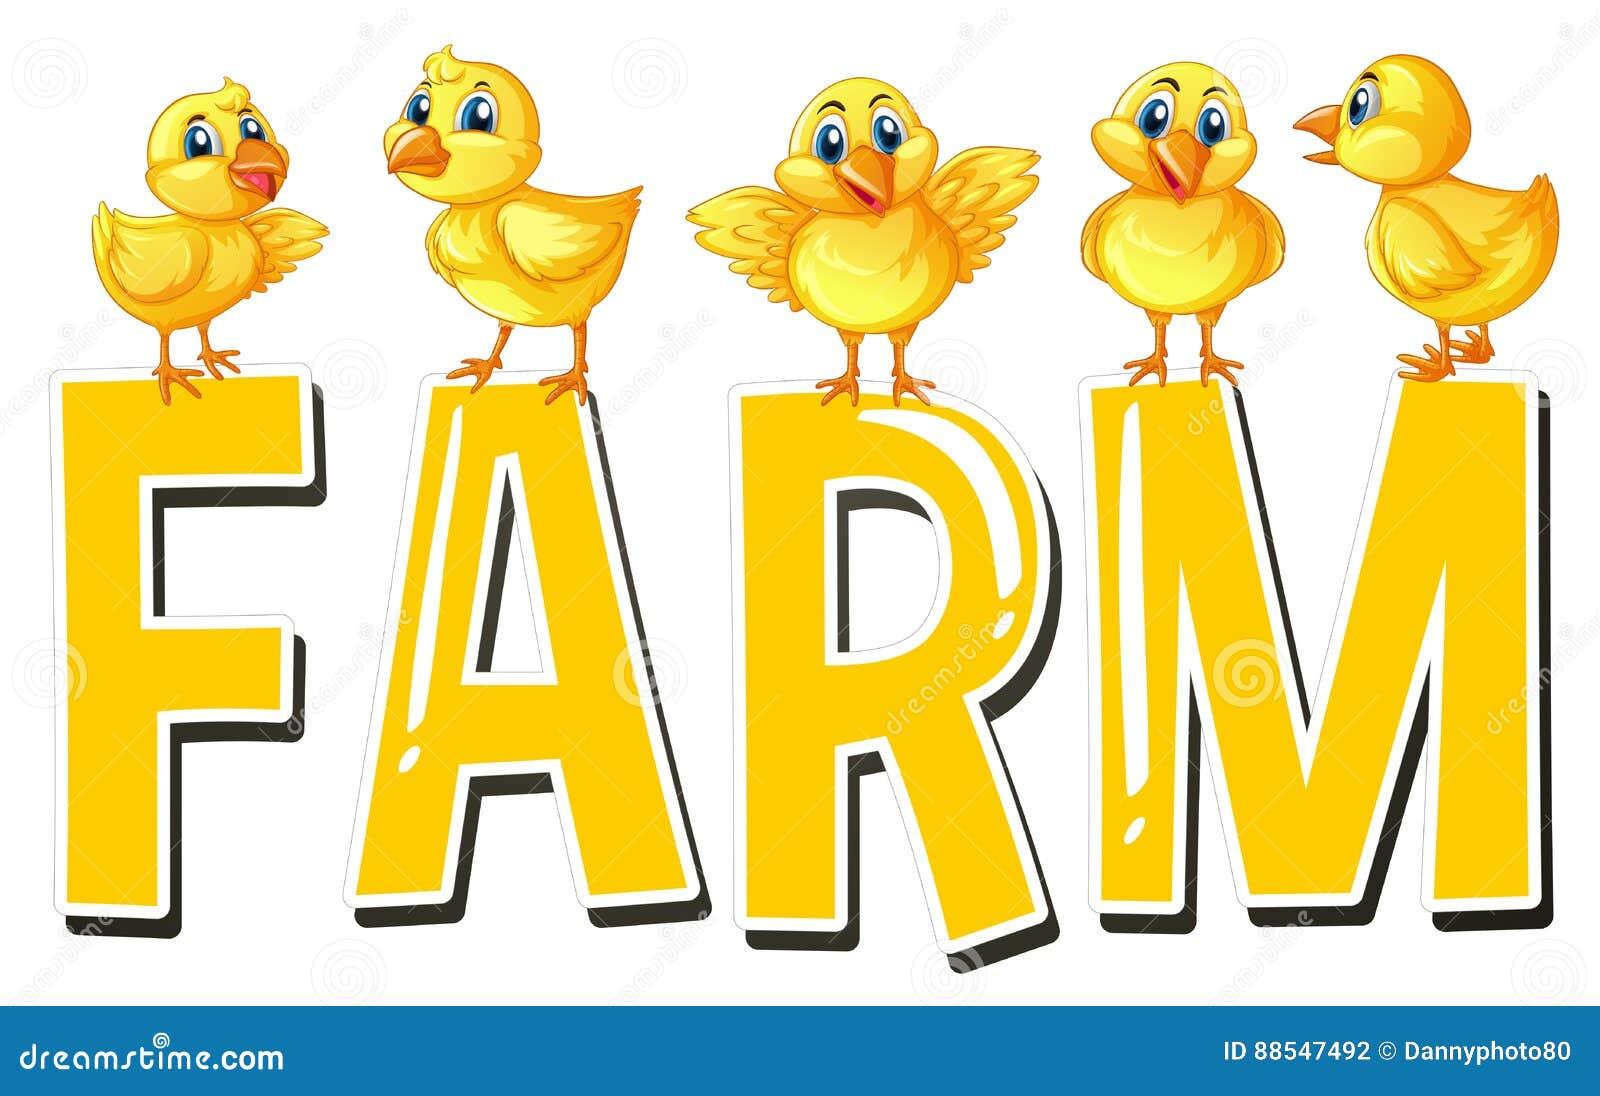 Дизайн шрифта для фермы слова